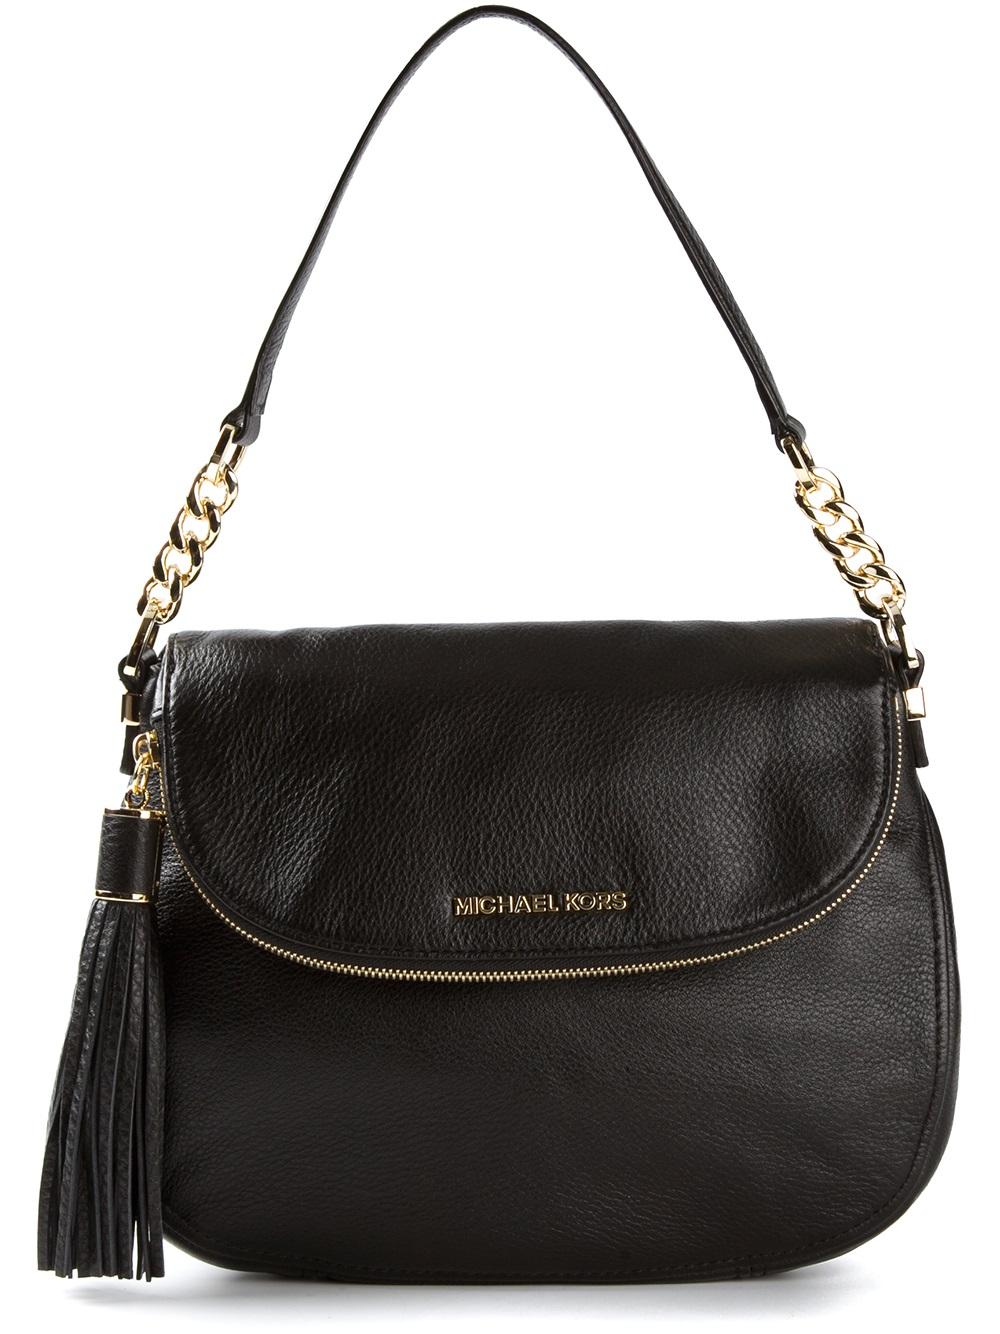 Lyst - Michael Kors Weston Shoulder Bag in Black